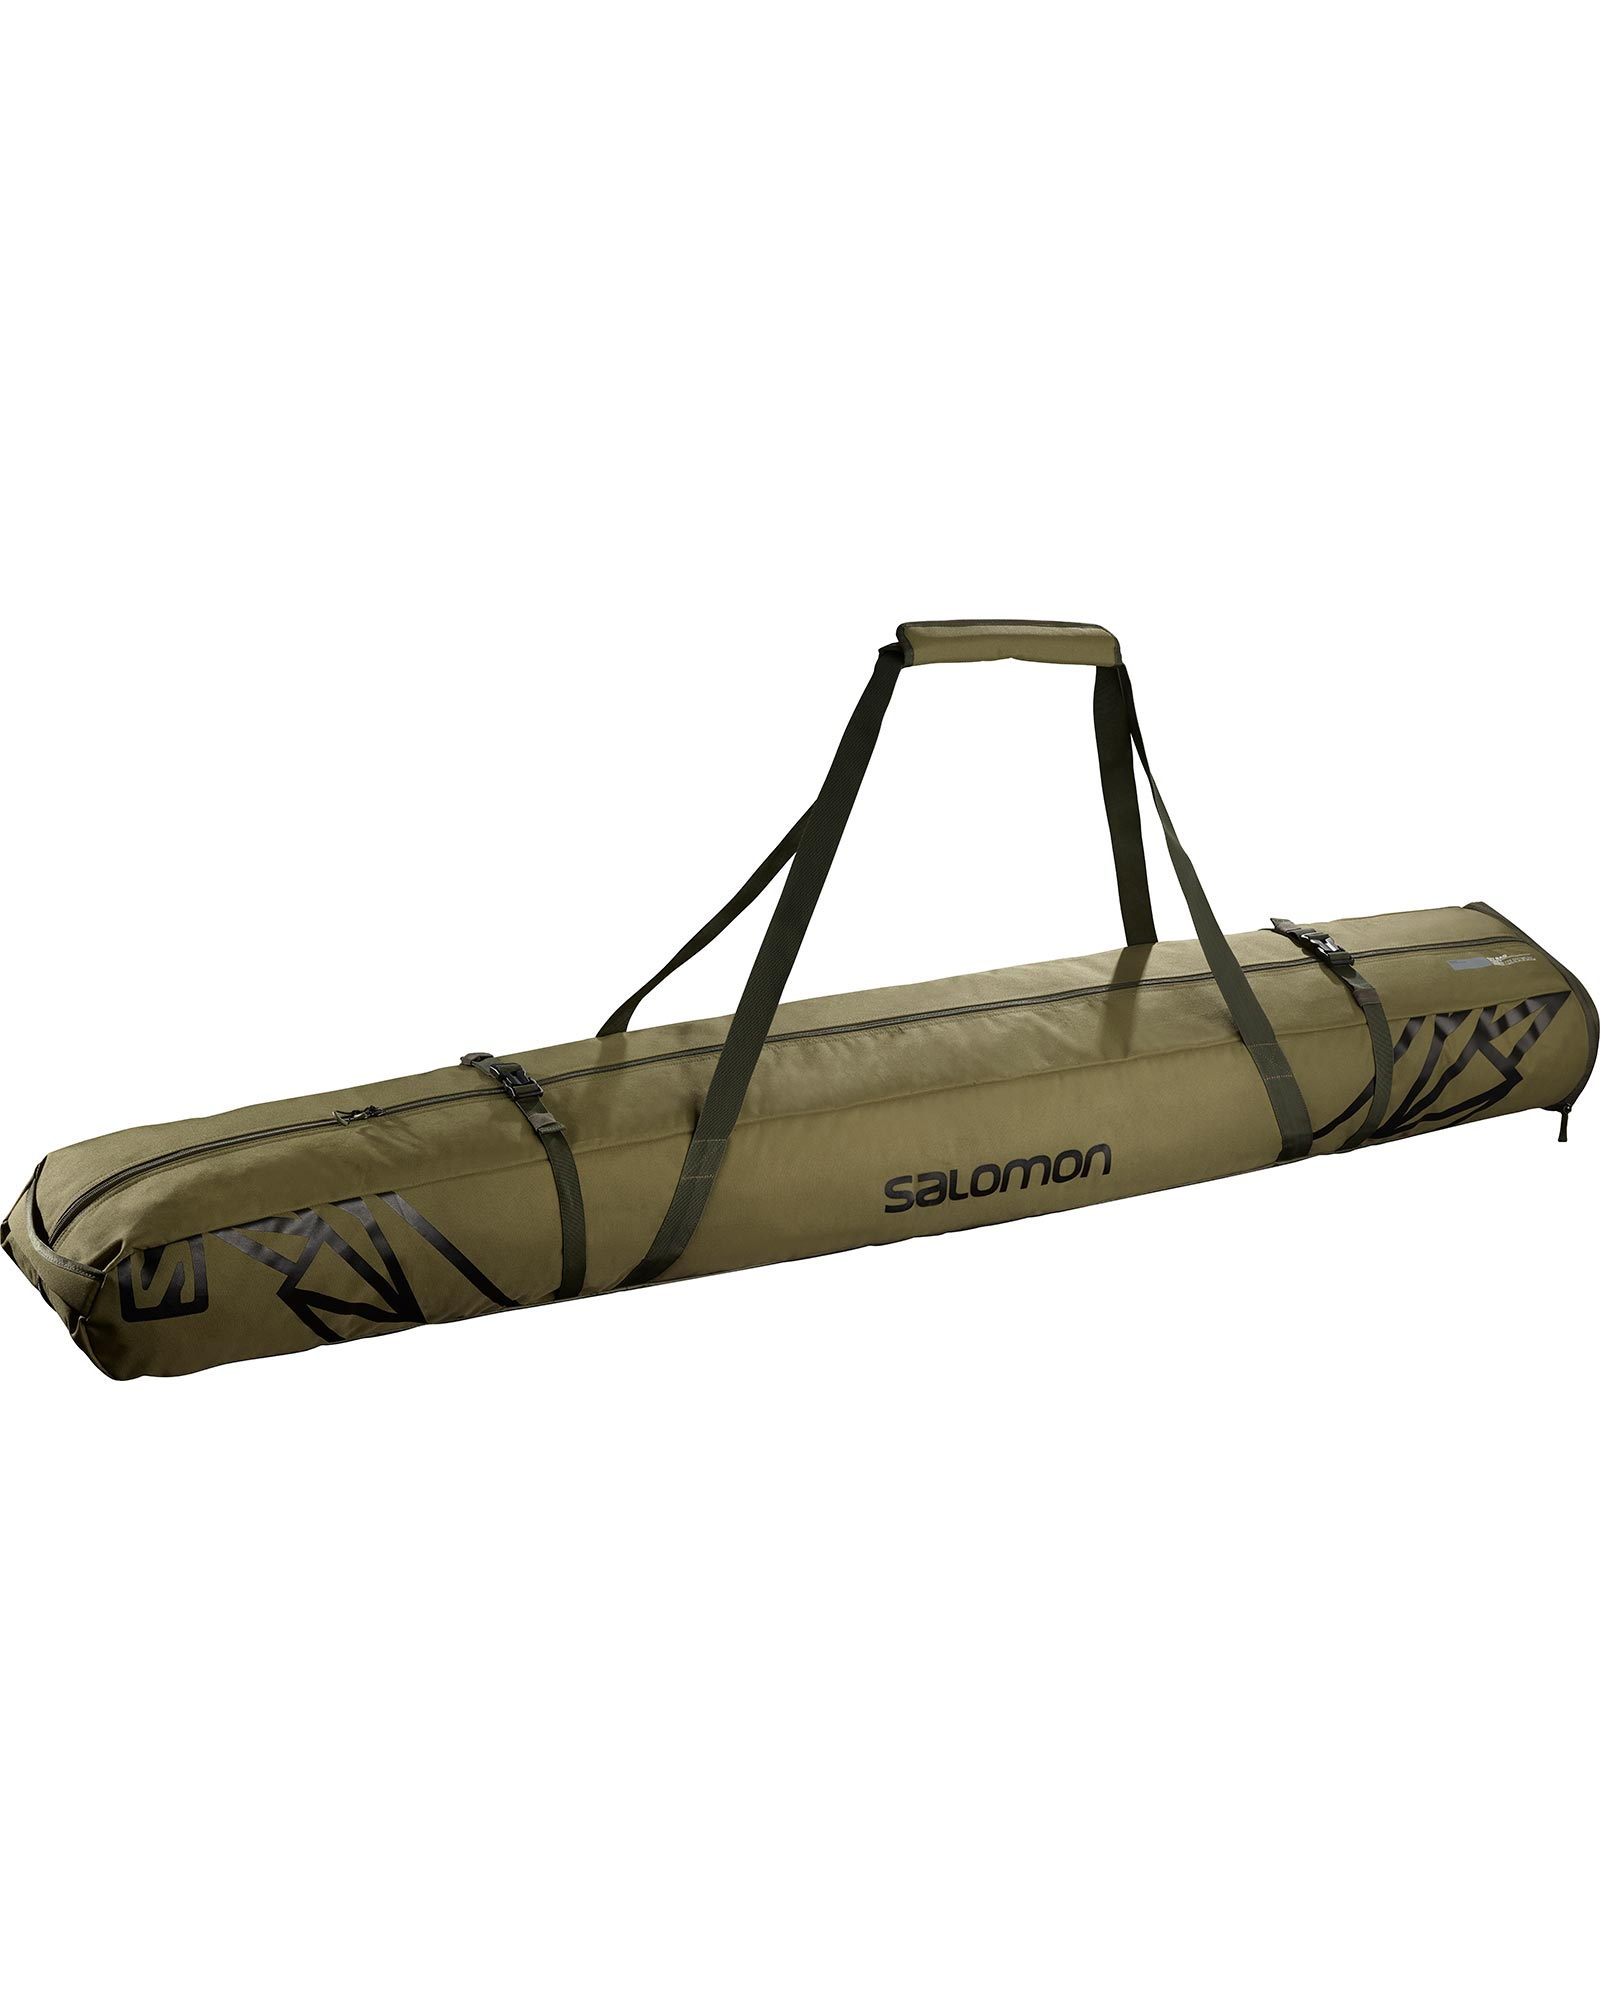 Product image of Salomon extend 2 Pairs 175+20 Ski Bag